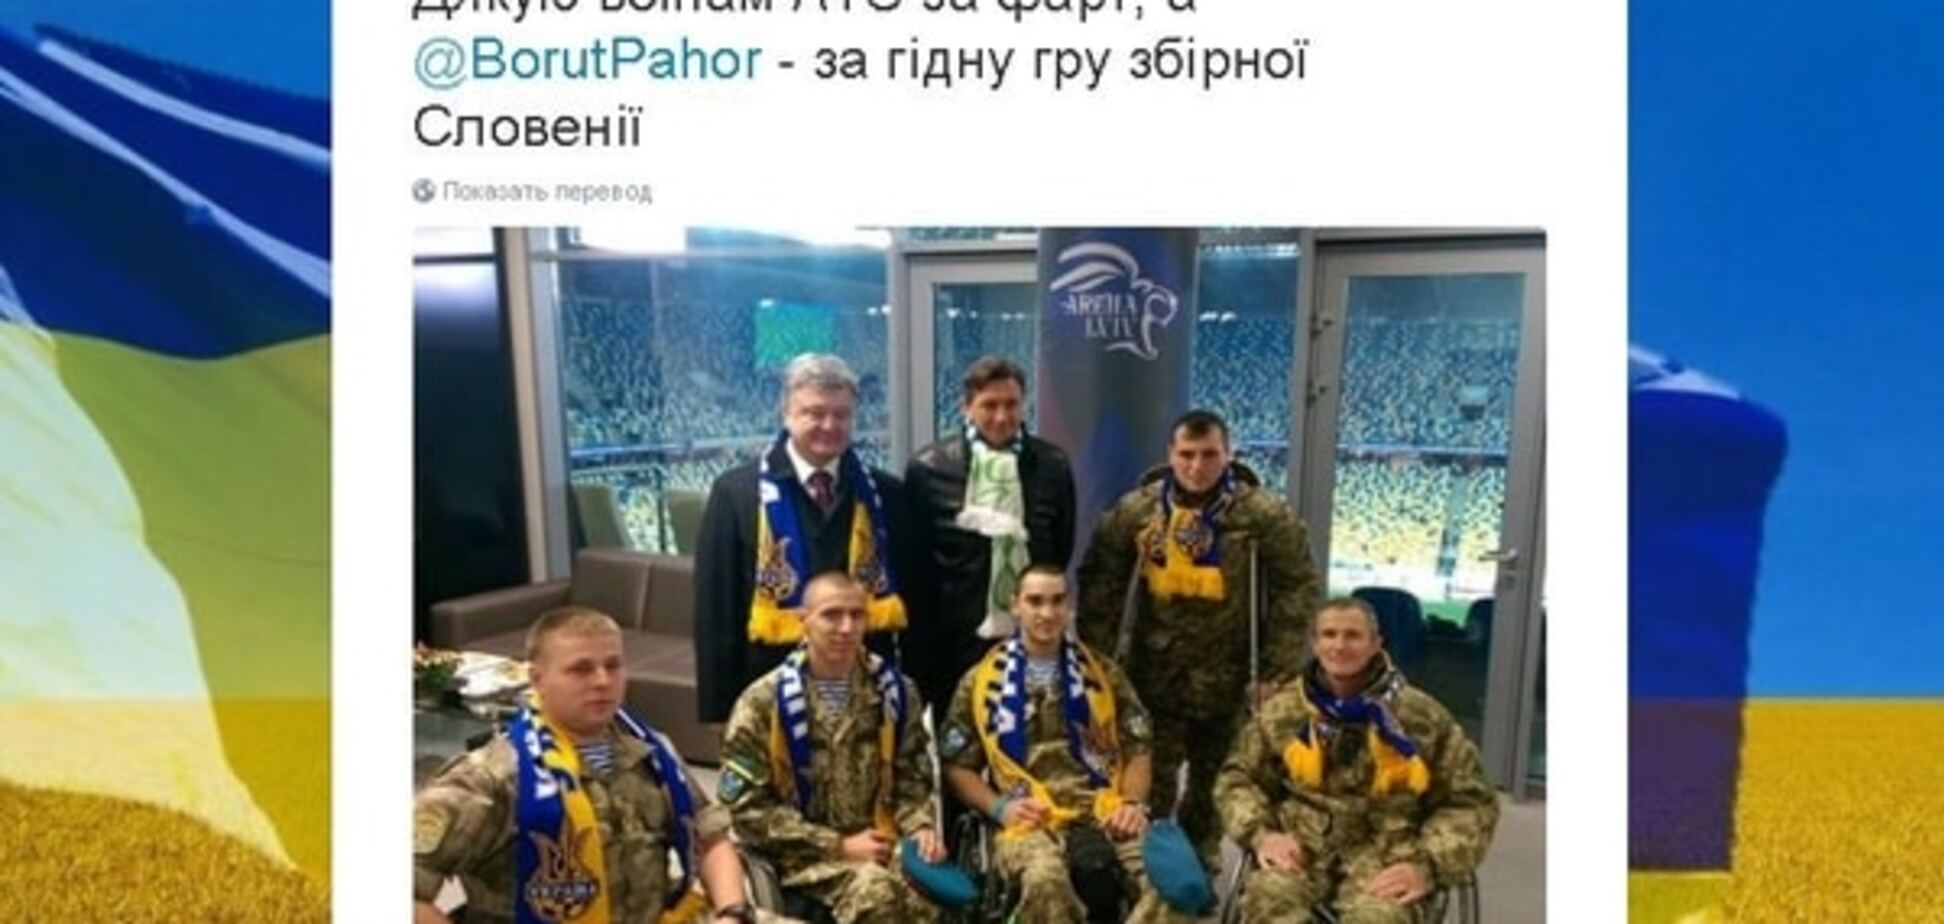 'Спасибо за фарт': Порошенко поблагодарил бойцов АТО после матча Украина - Словения